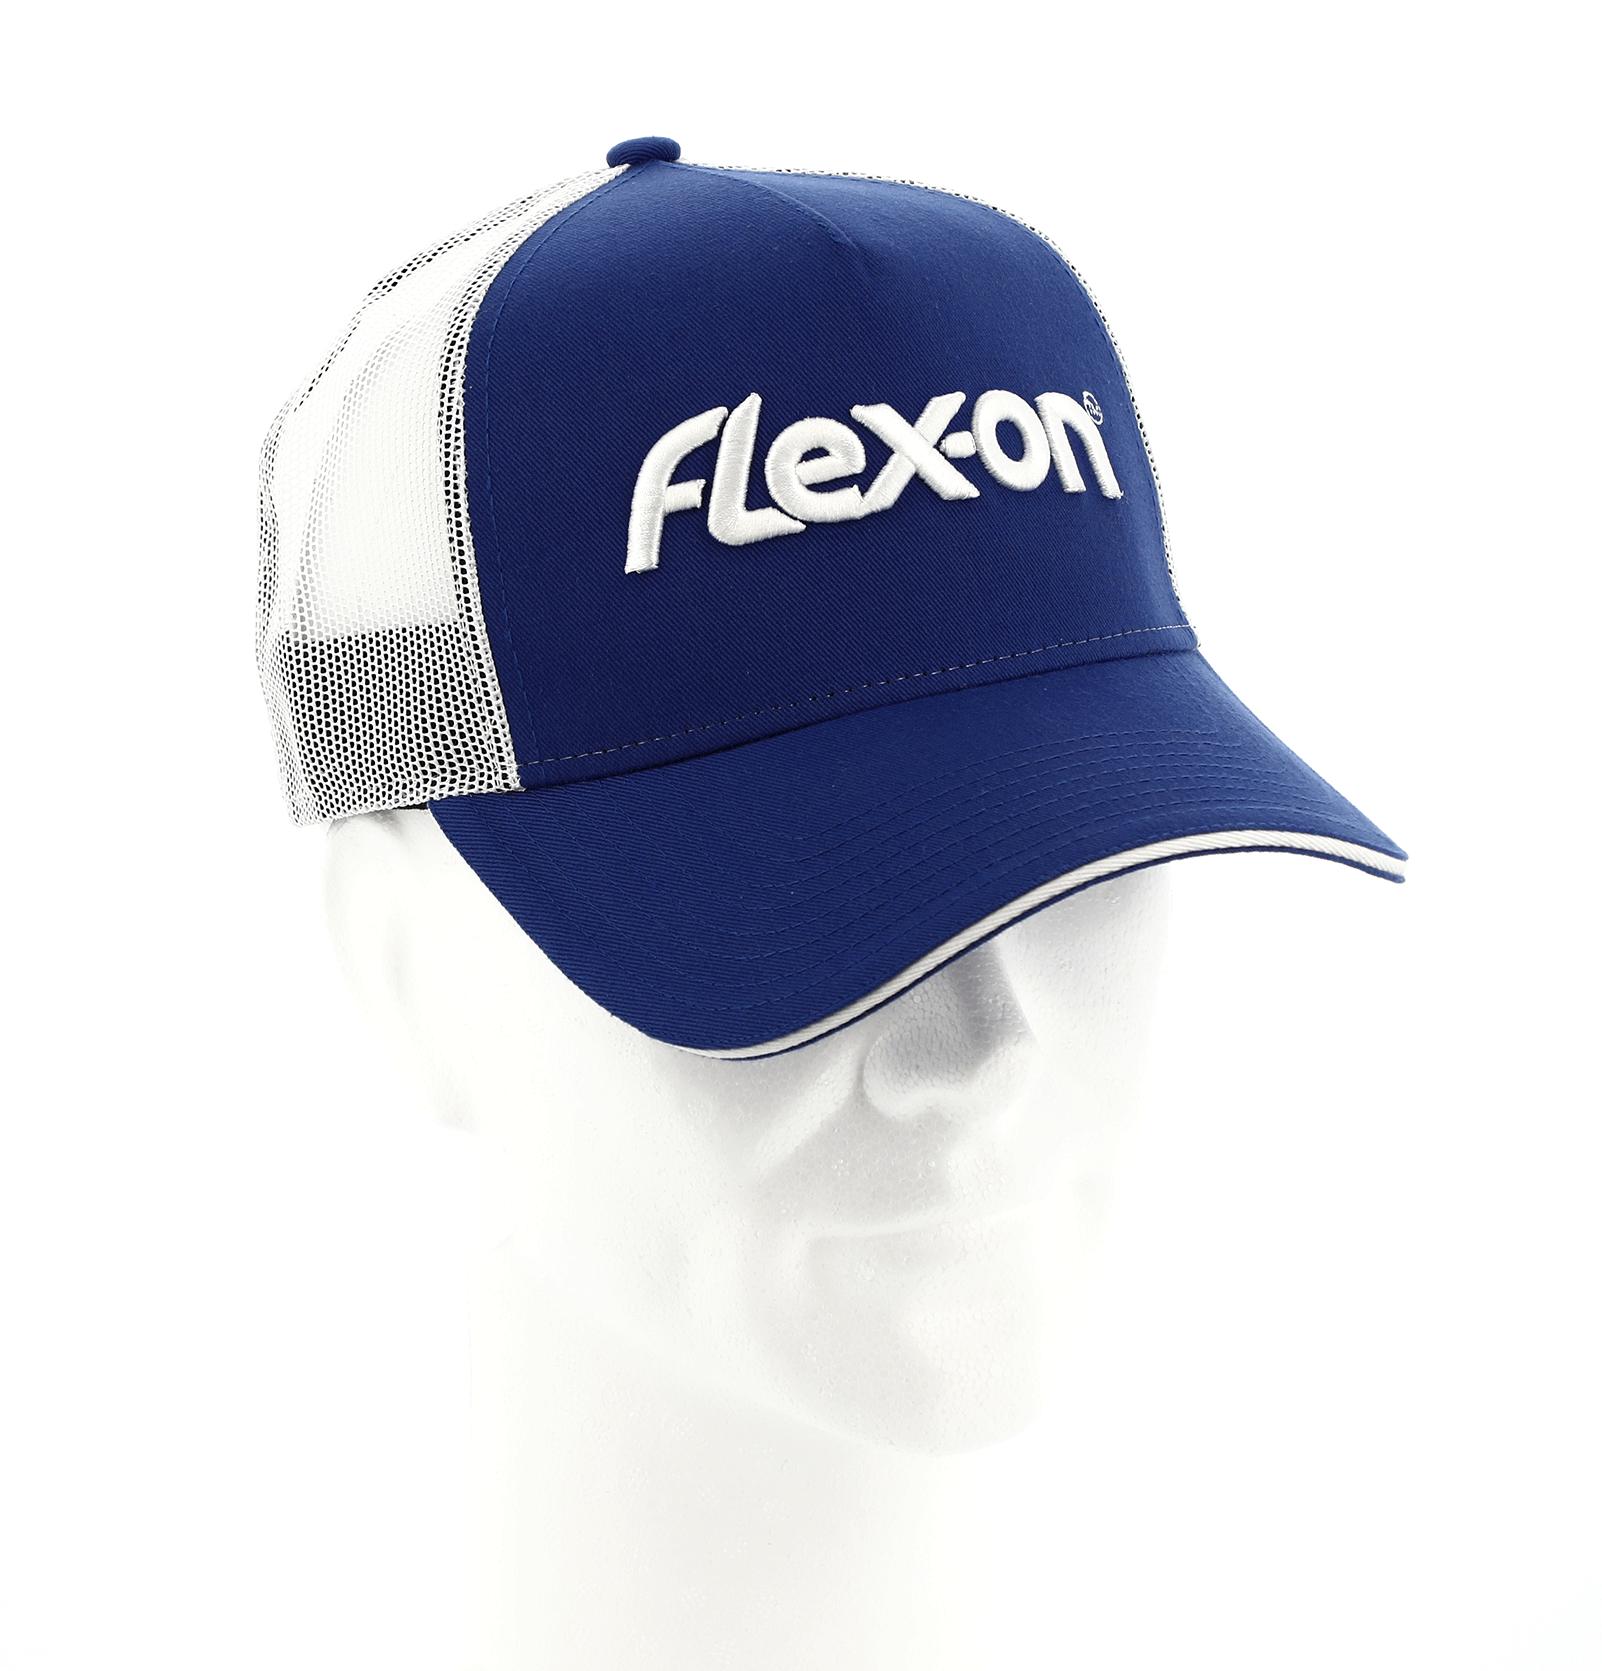 Casquette Flex-On